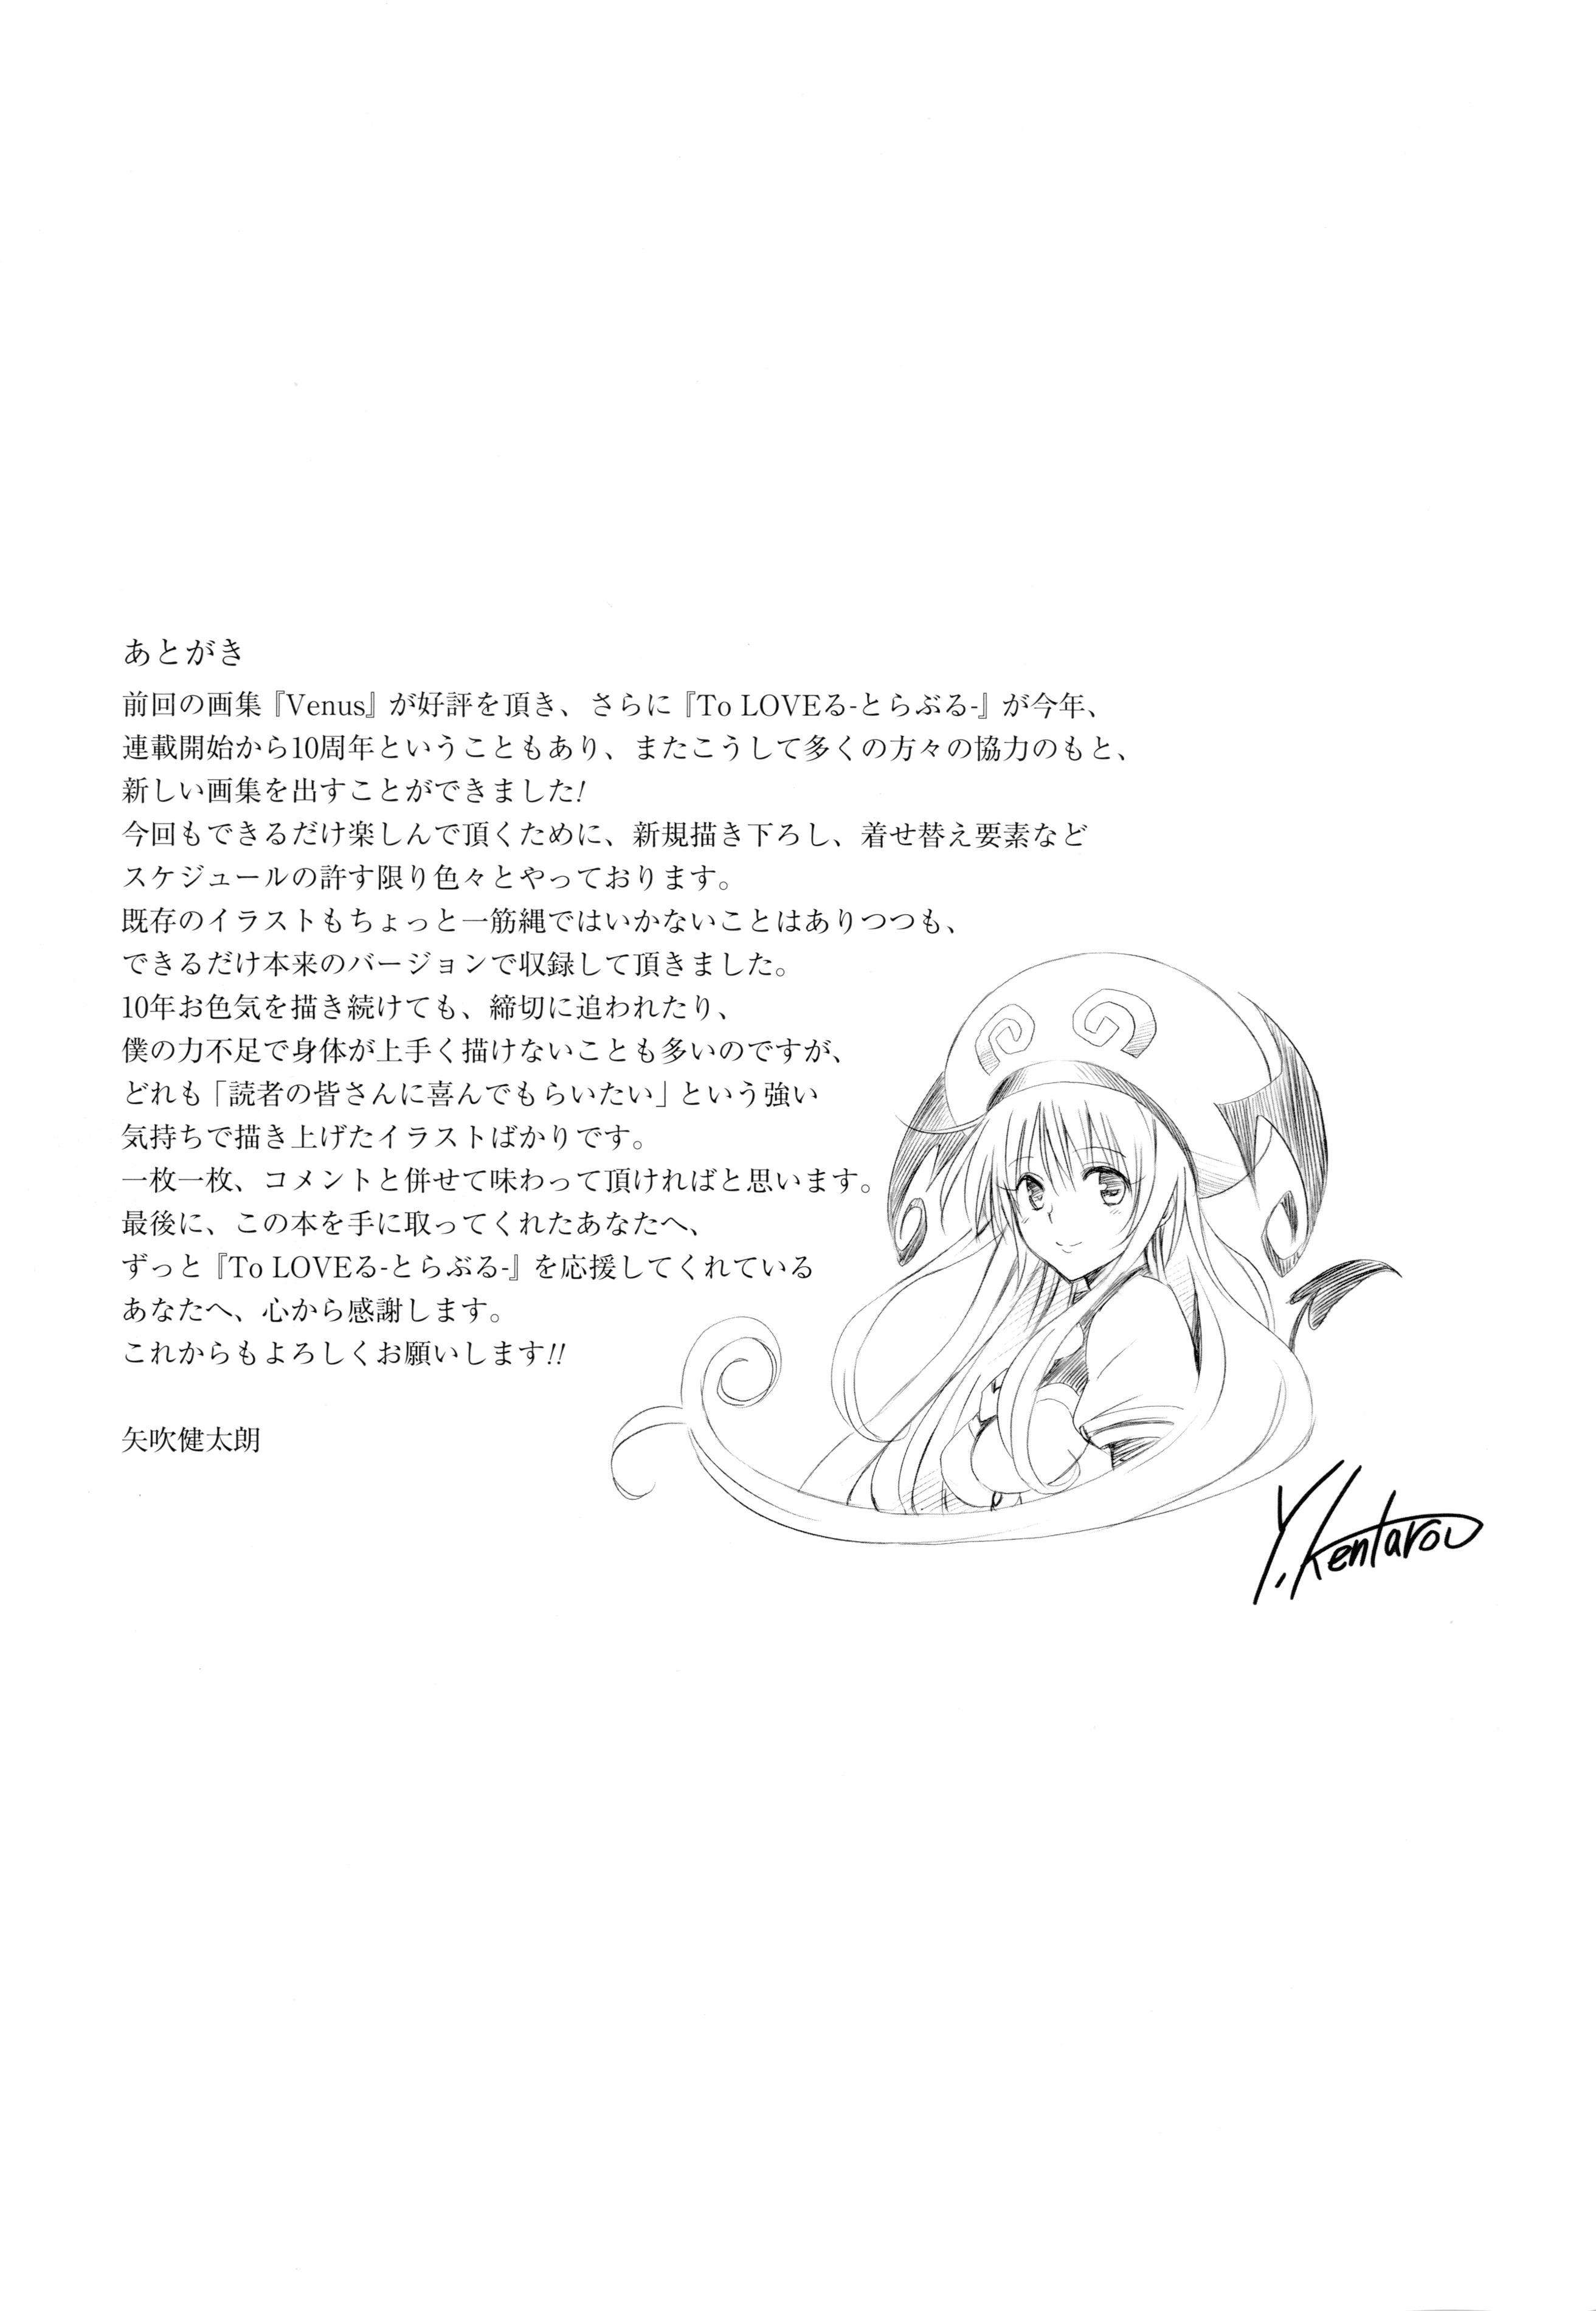 [Yabuki Kentaro] To Love-Ru -Trouble- Darkness Artbook Harem Gold 149